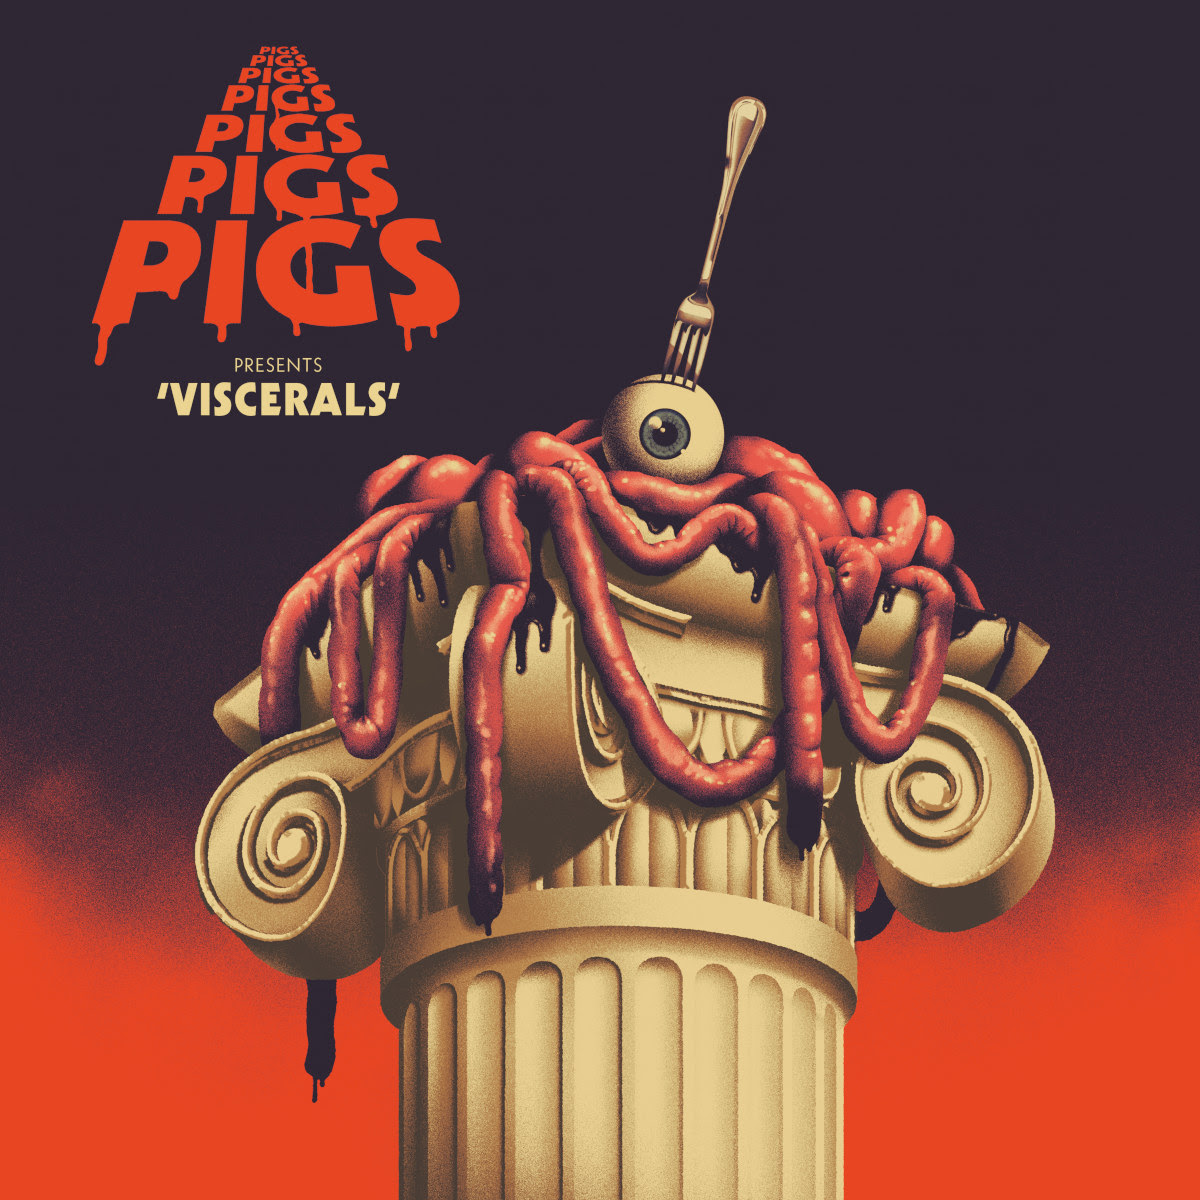 Pigs Pigs Pigs Pigs Pigs Pigs Pigs Viscerals album